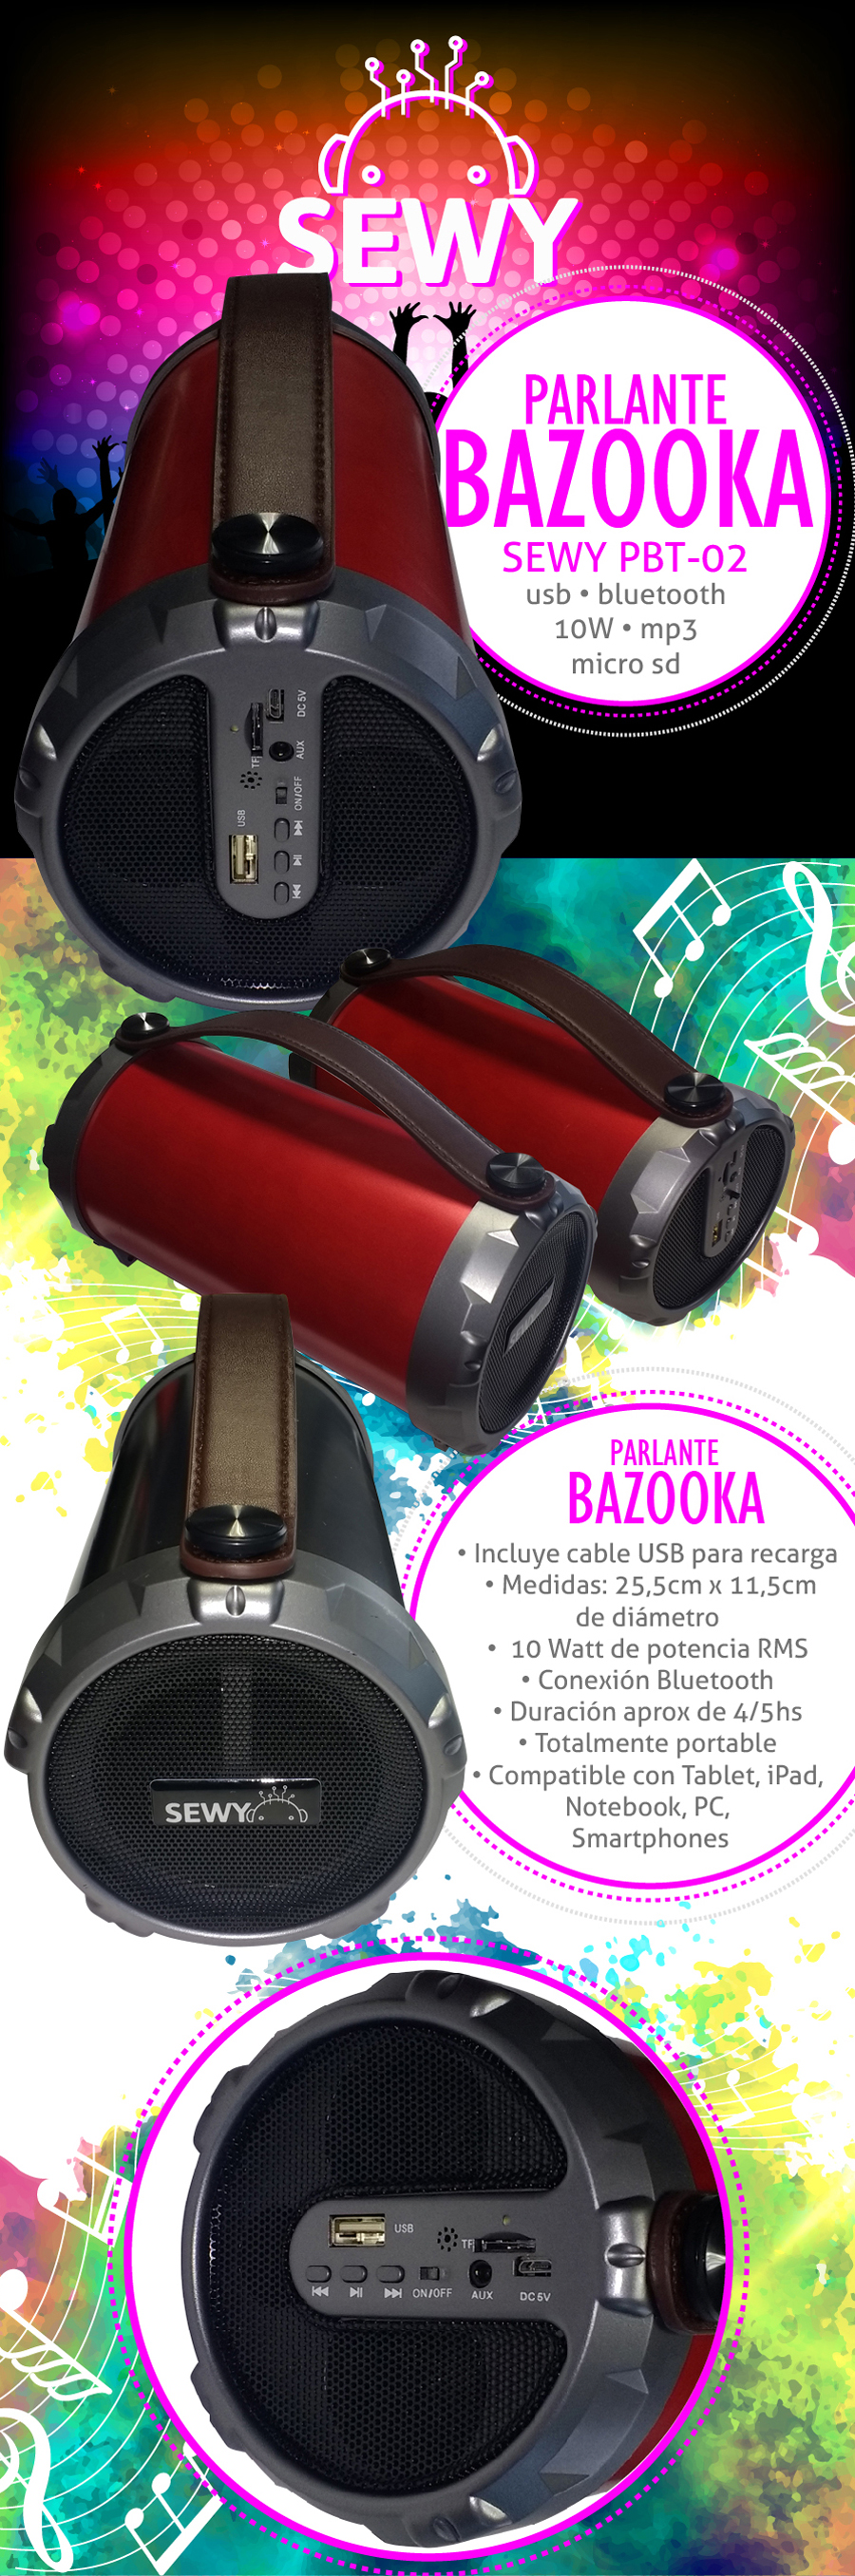 Parlante Bazooka Sewy PBT-02 12W USB MP3